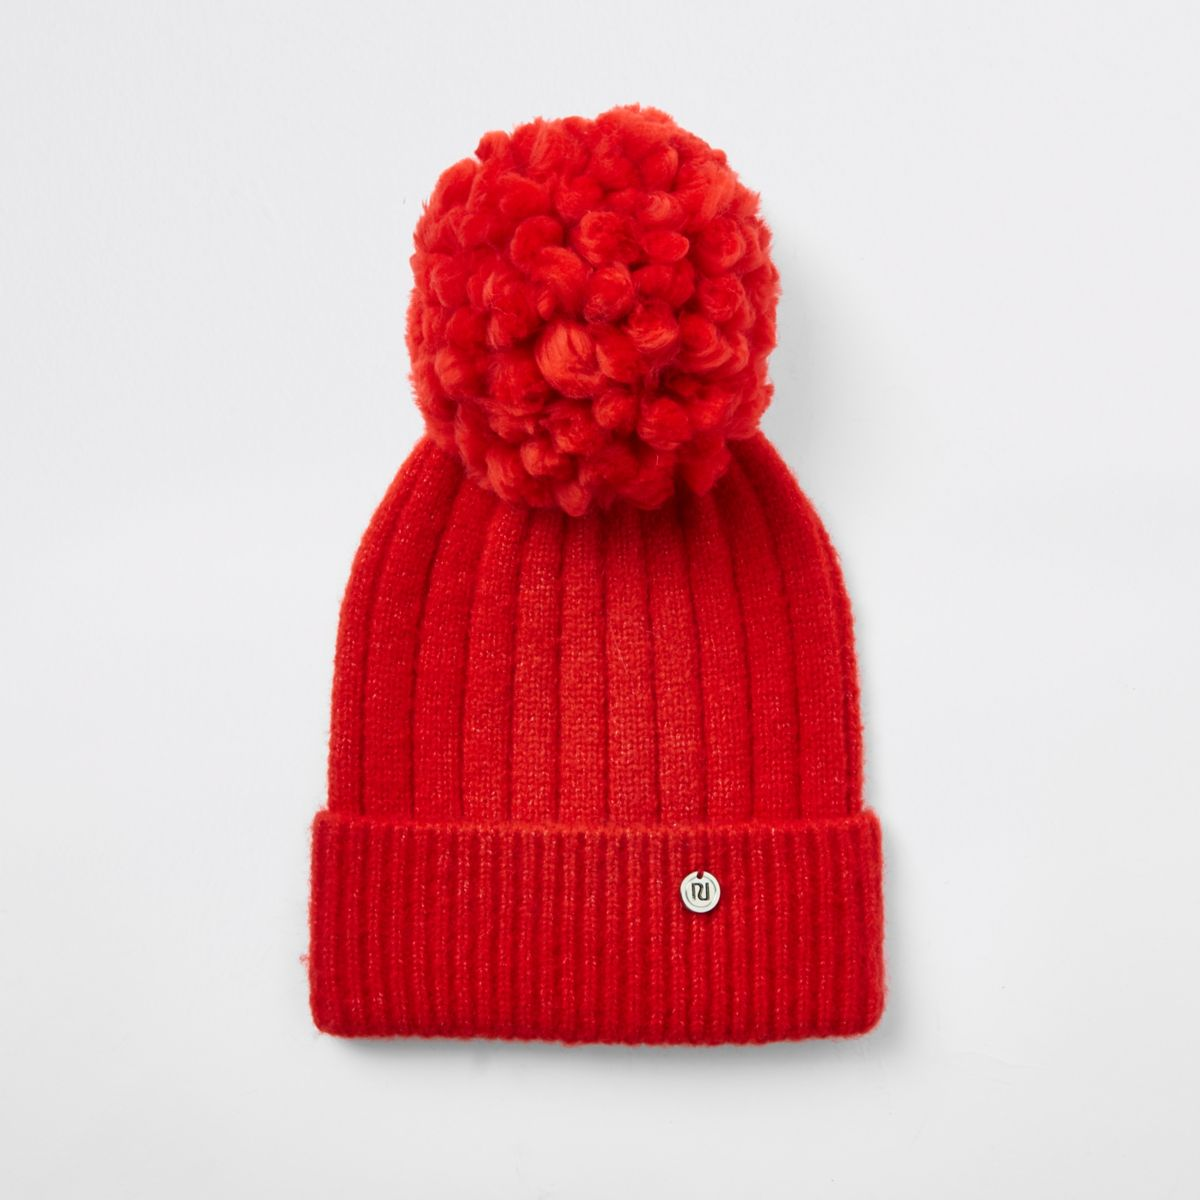 Red pom pom bobble top knit beanie hat